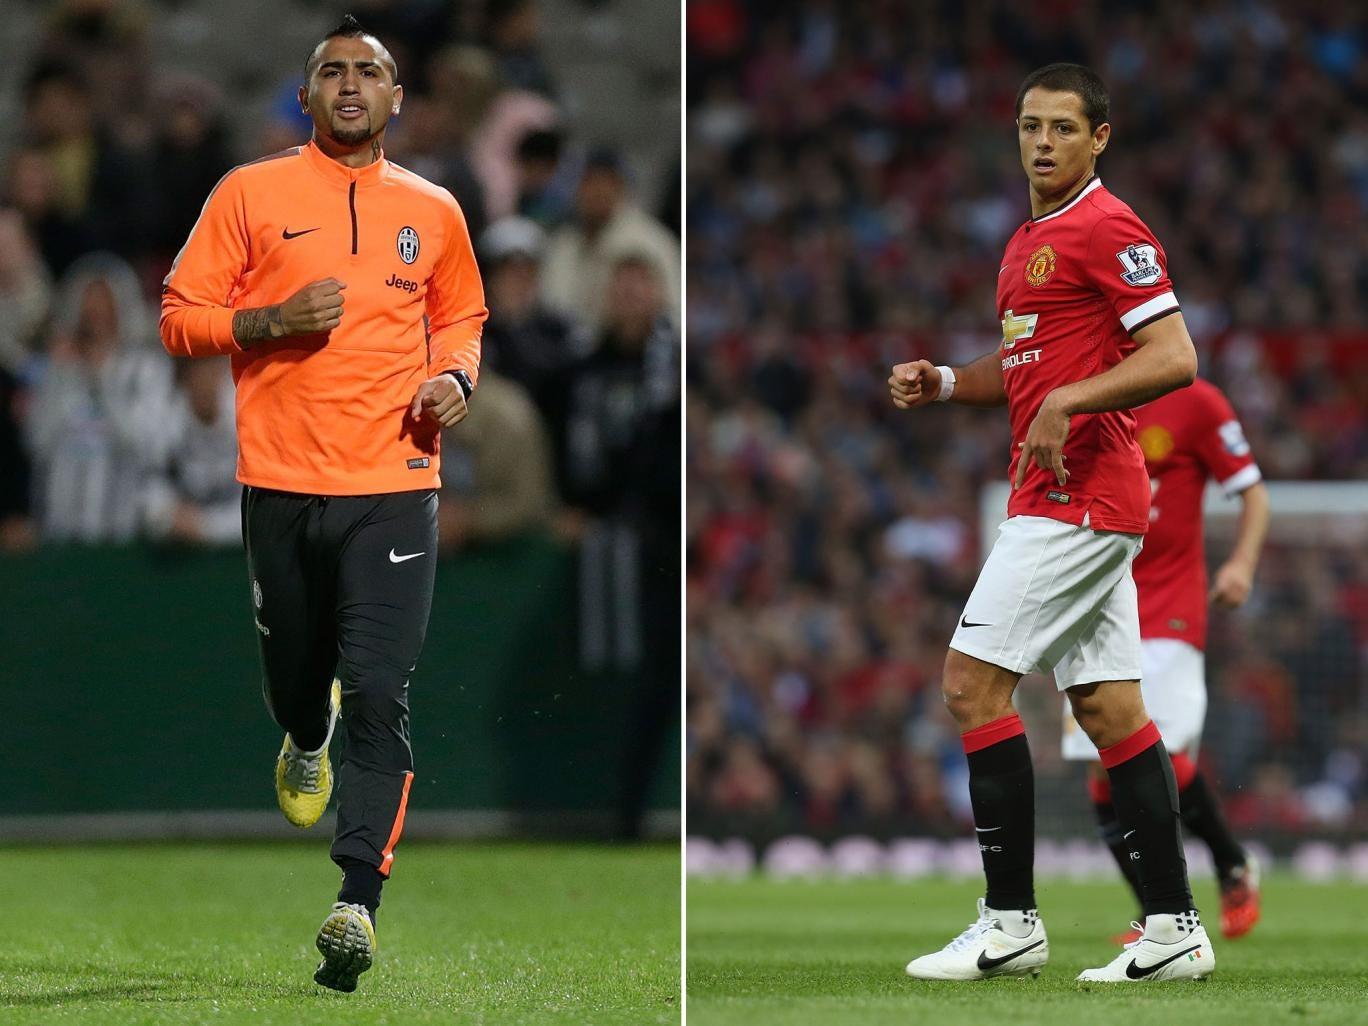 Arturo Vidal and Javier Hernandez could swap clubs this summer